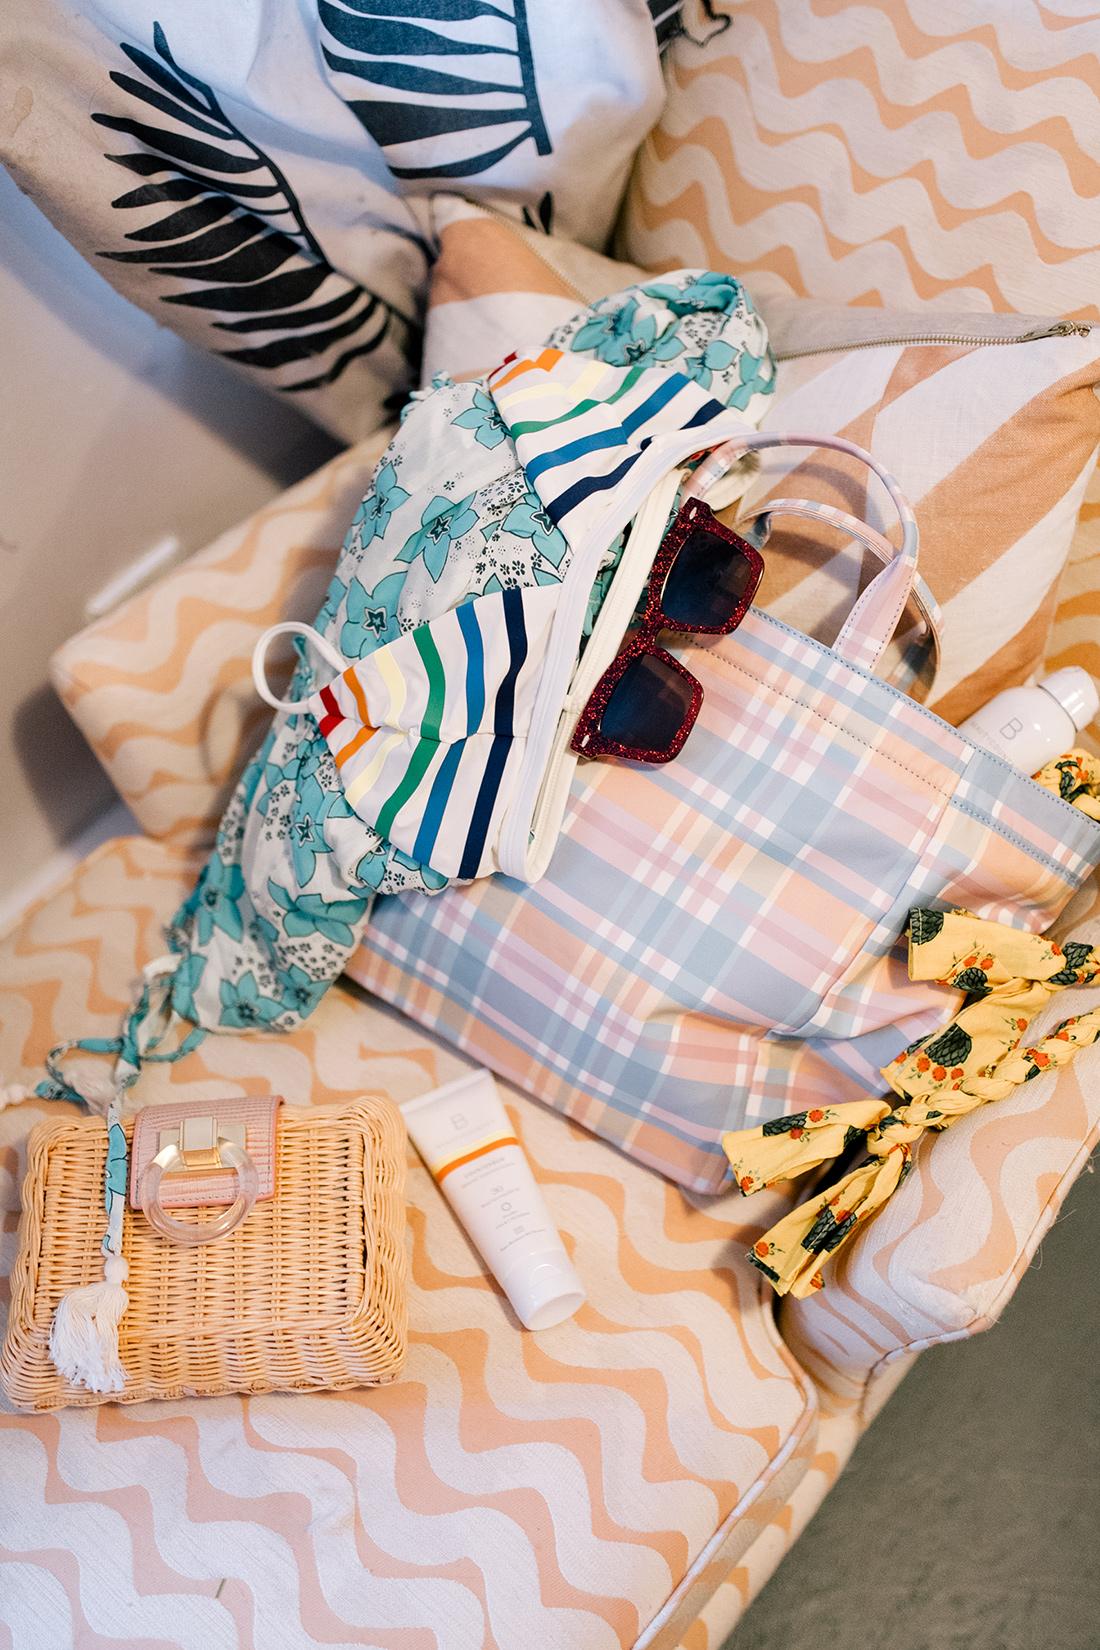 products featured: rainbow bikini top // pamela munson plaid bag (c/o) // pamela munson straw clutch (c/o) // karen walker sunglasses // beautycounter sunscreen (c/o) // rhode resort ella dress